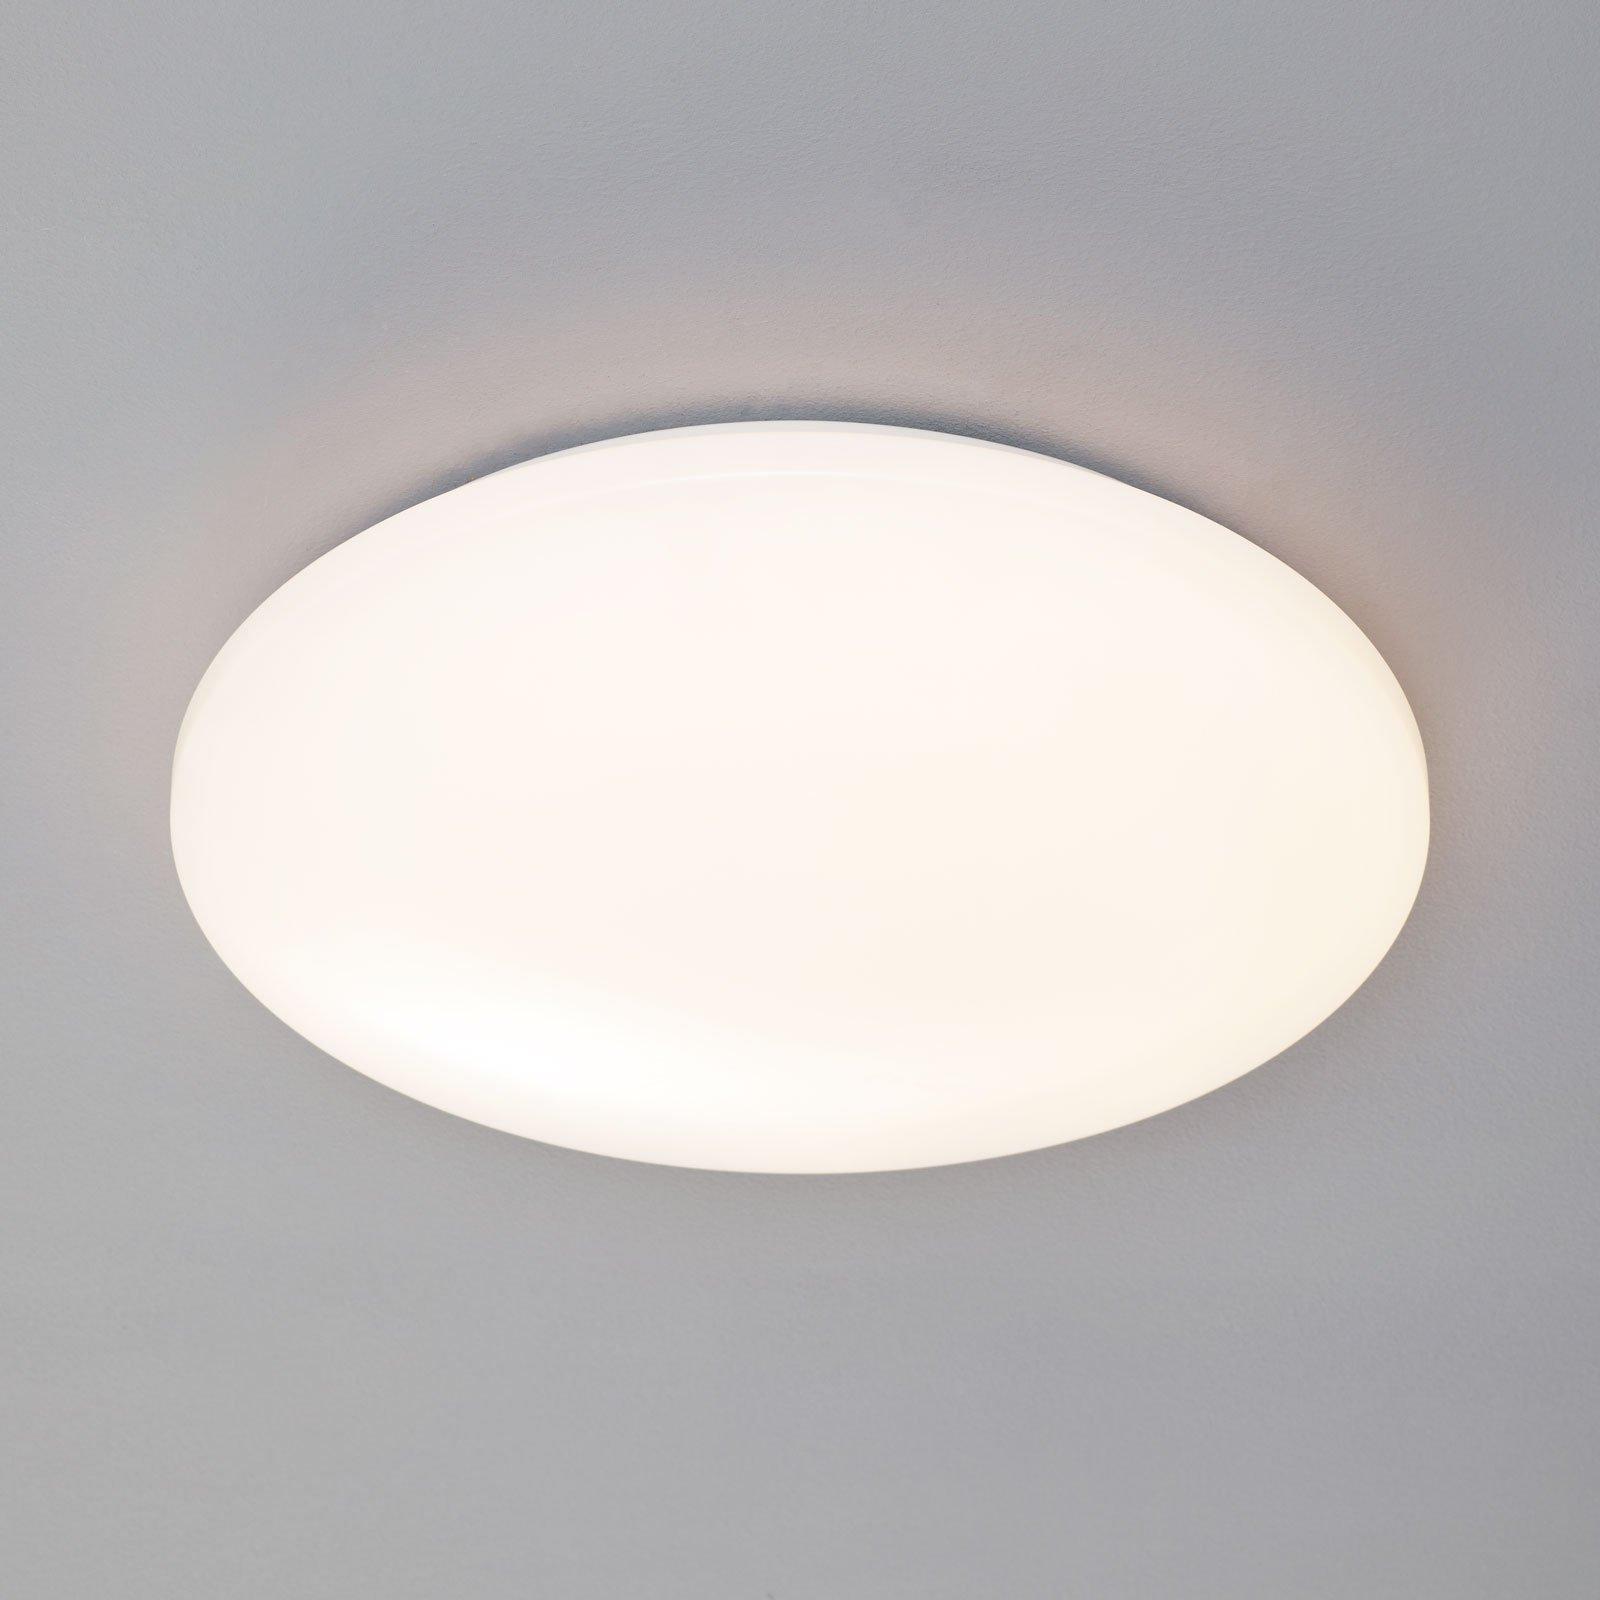 LED-taklampe Pollux, bevegelsessensor, Ø 40 cm